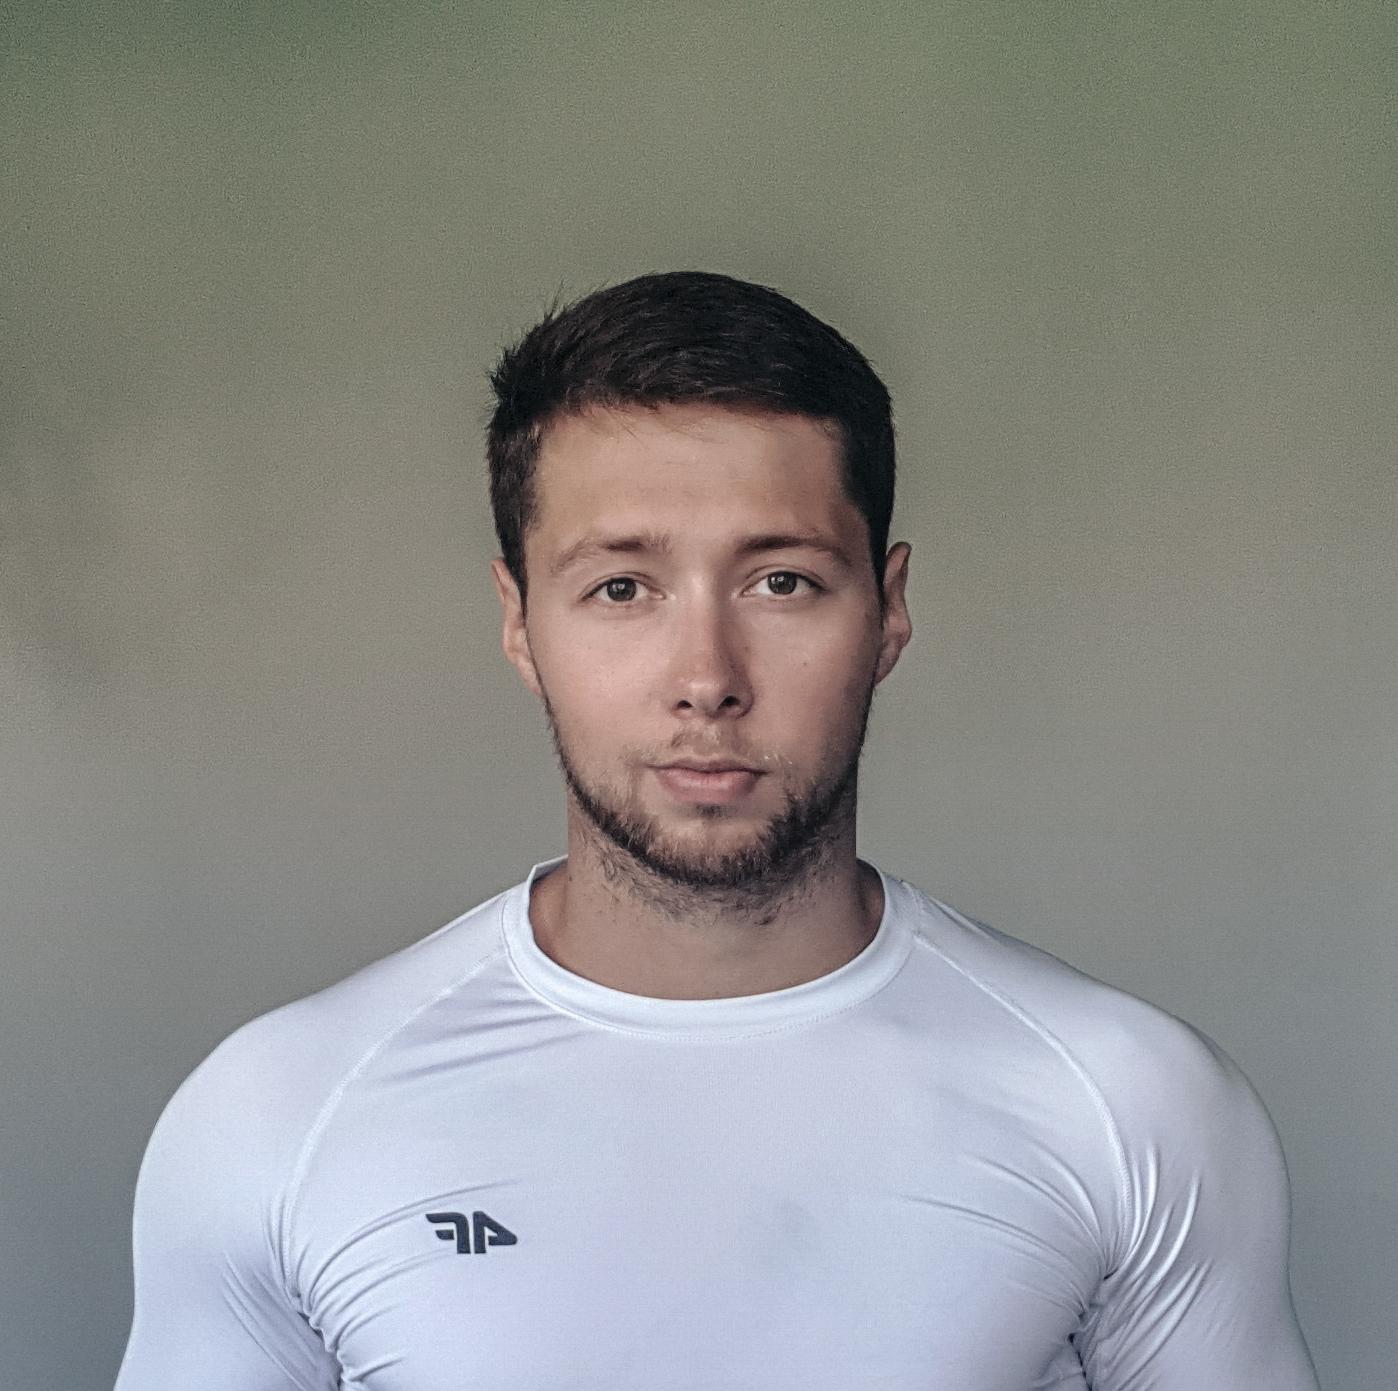 Marcin Dobrzeniecki